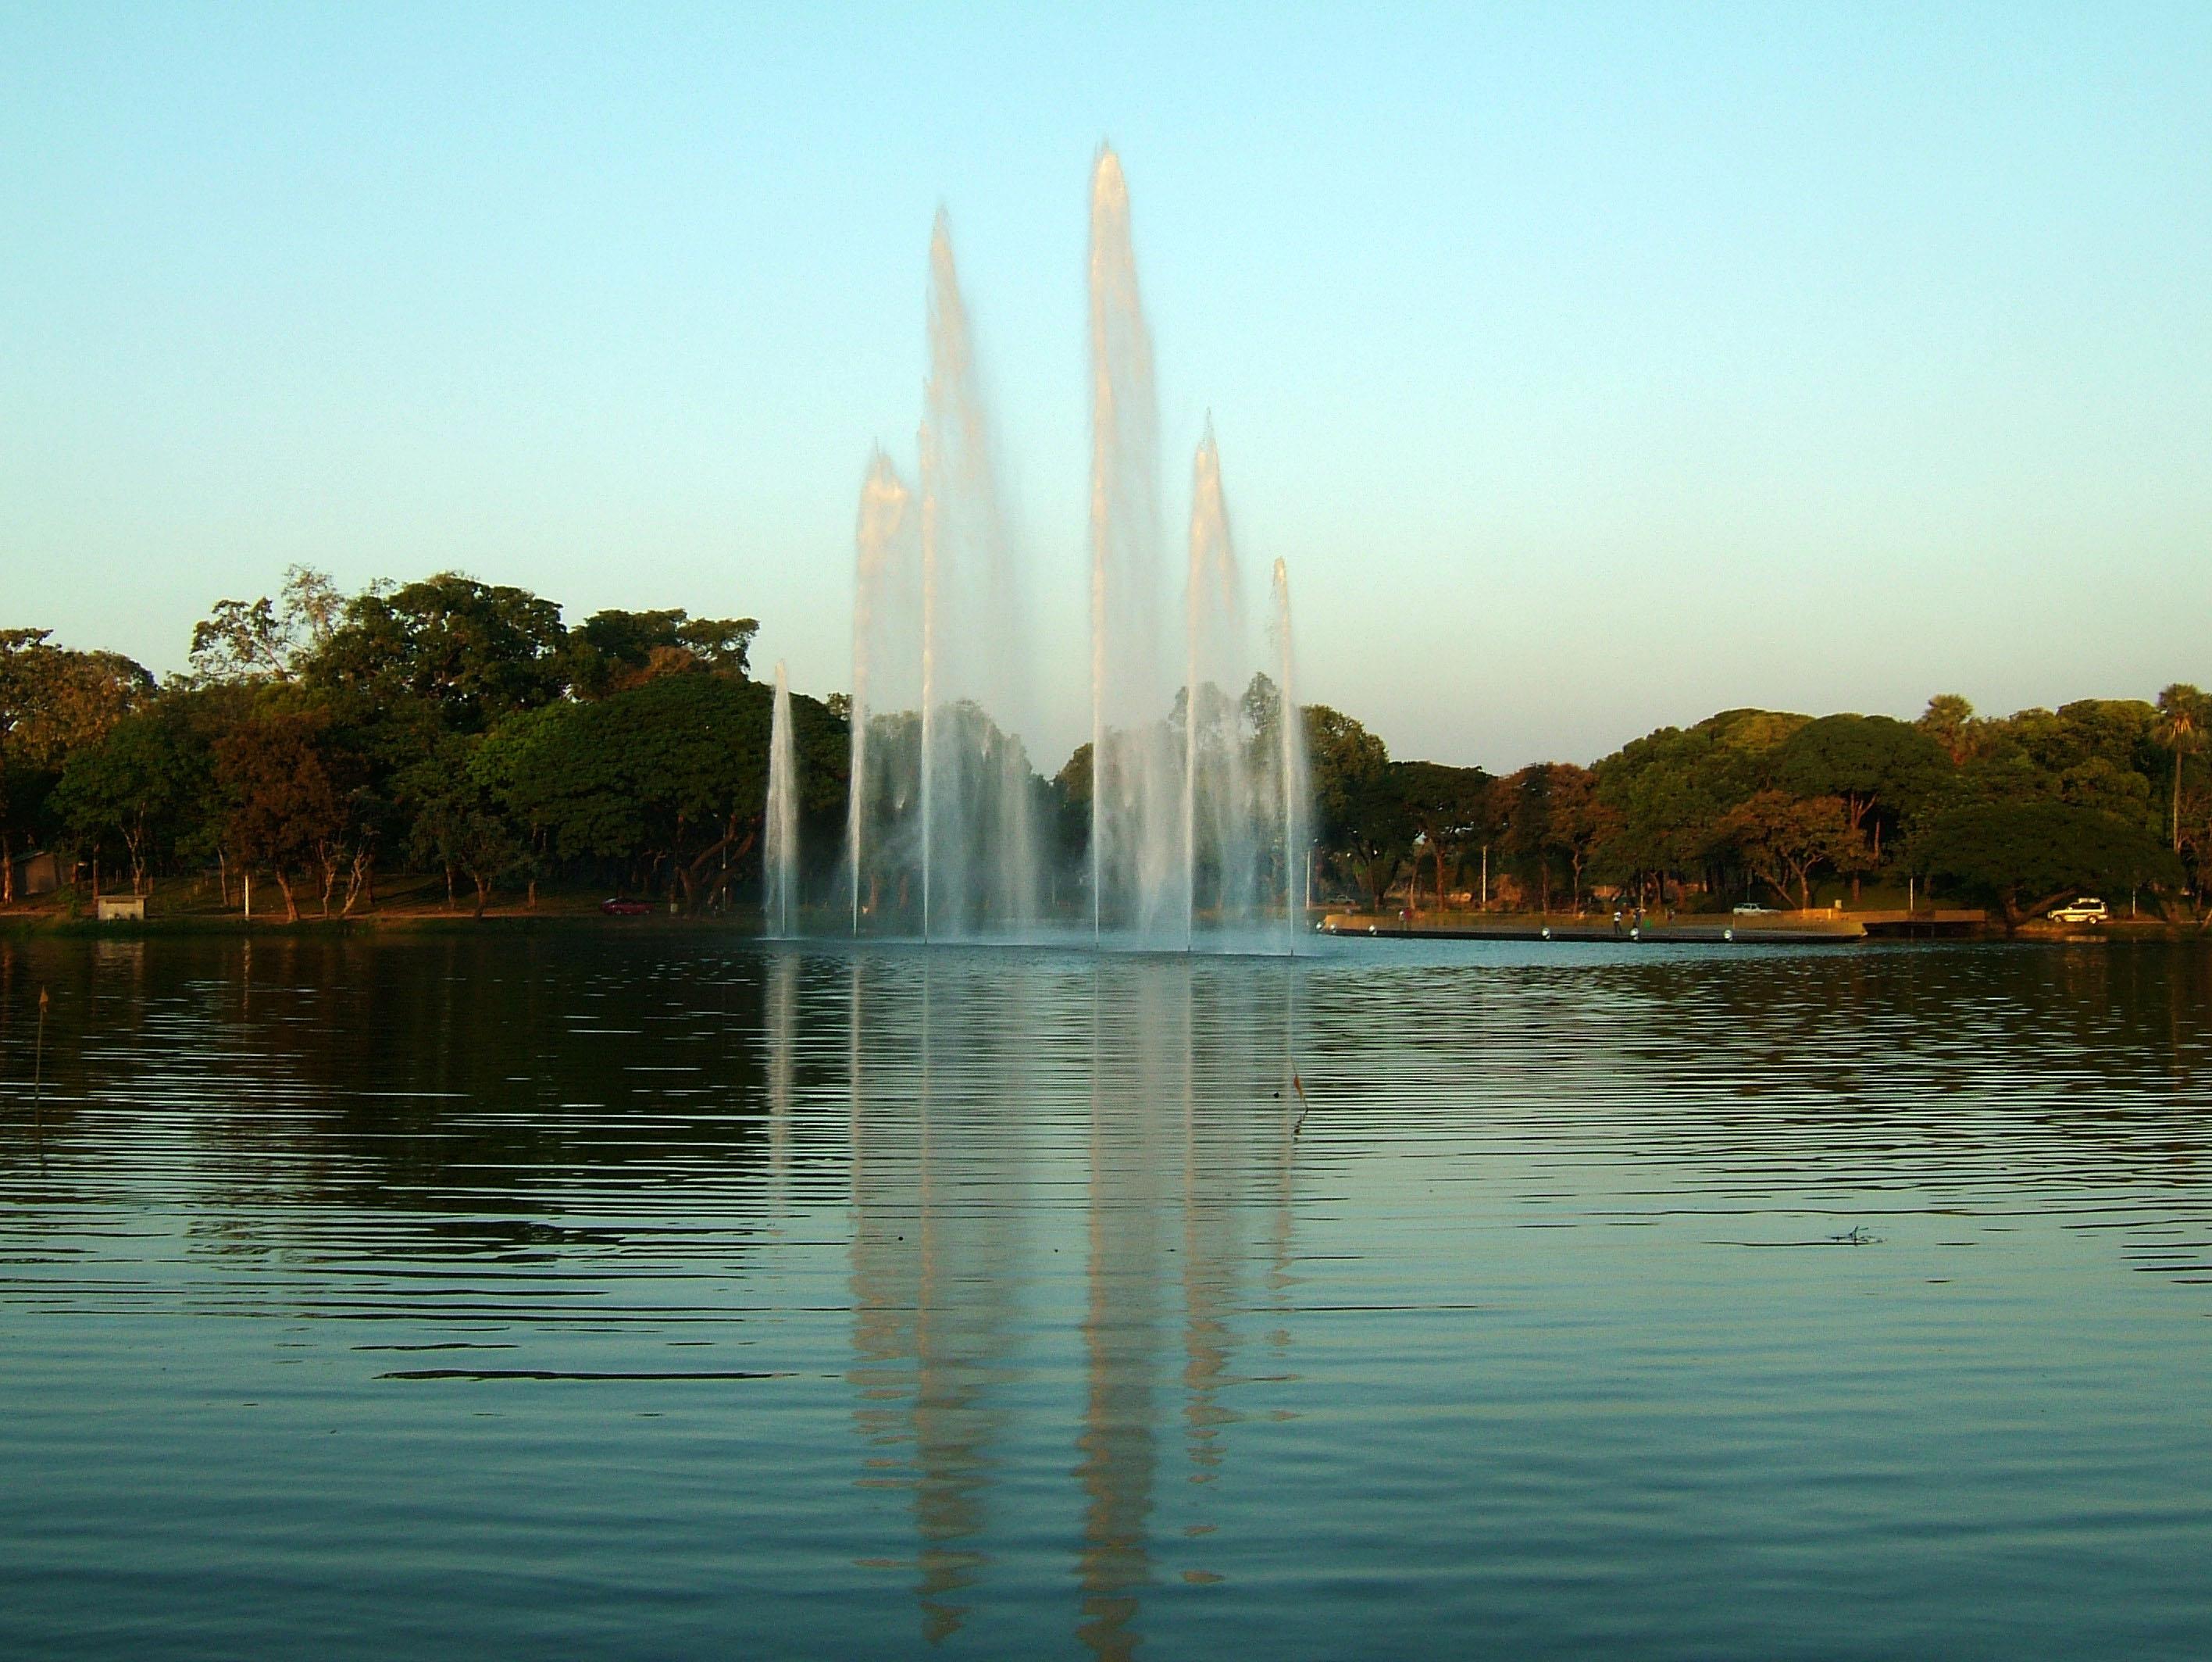 Yangon Kandawgyi Lake fountain panoramic views Nov 2004 03